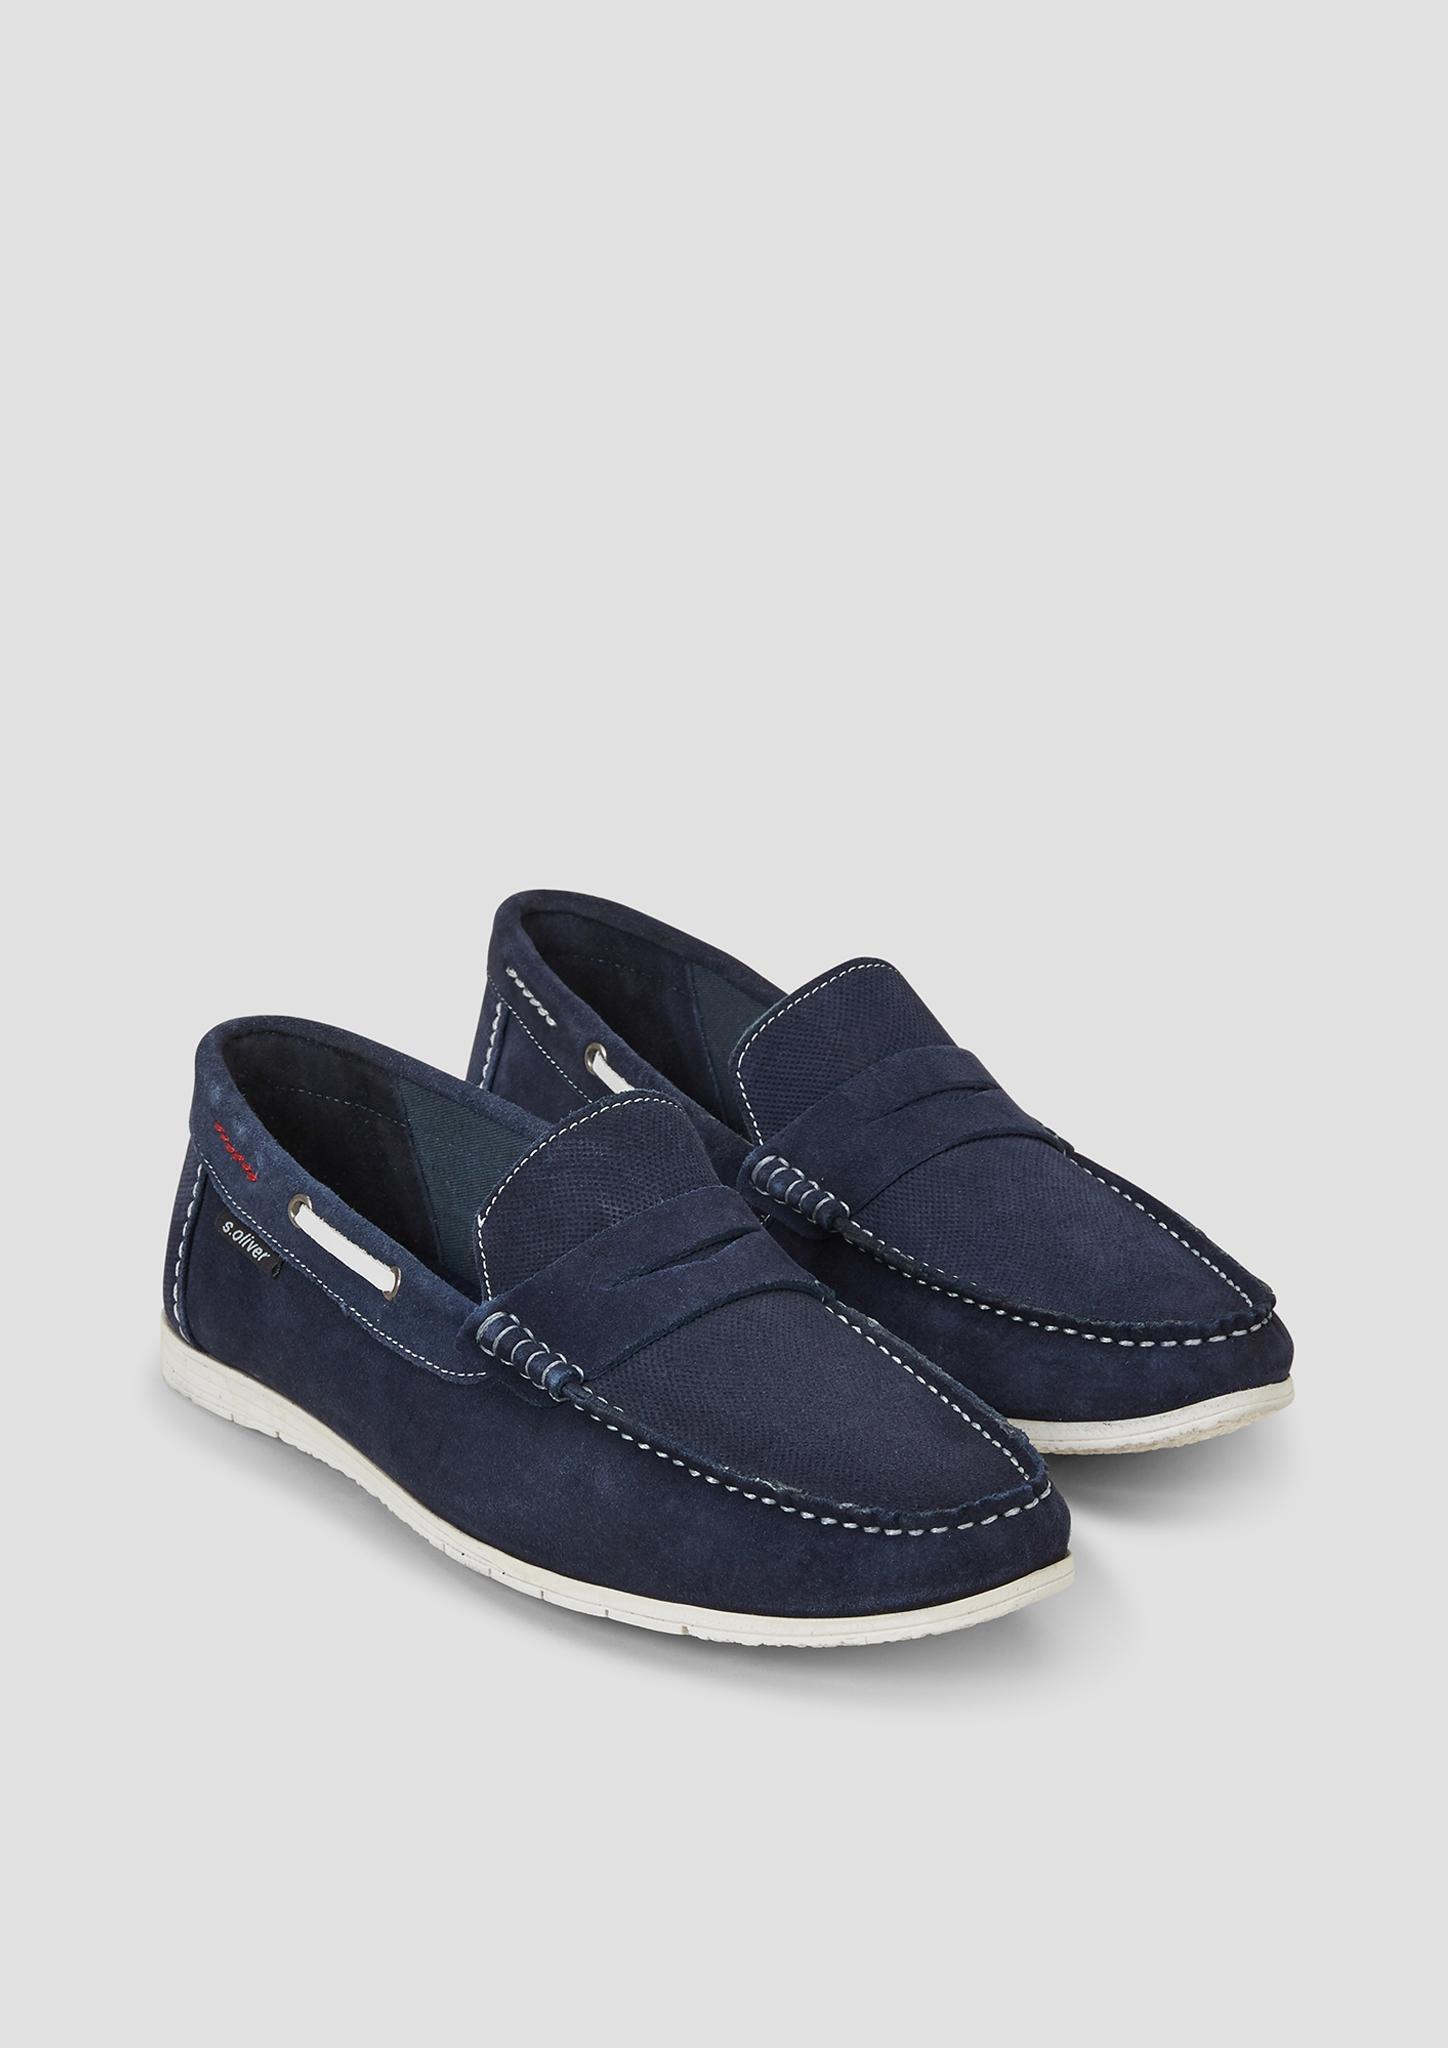 Leder-Slipper | Schuhe > Slipper | Blau | Obermaterial: leder| futter: textil| decksohle: textil| laufsohle: synthetik | s.Oliver